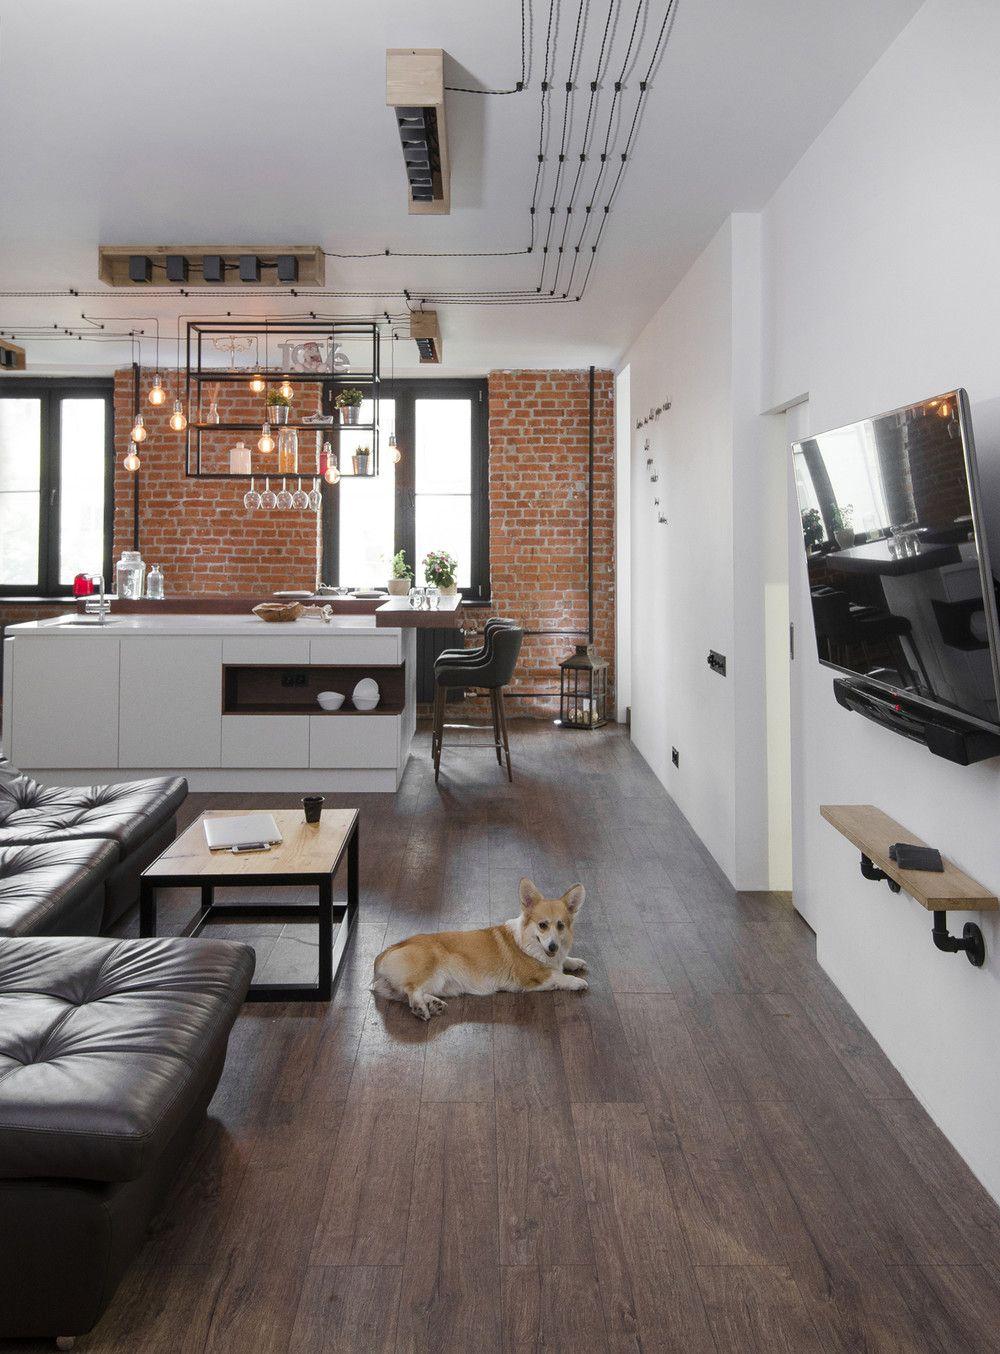 adelaparvu.com despre apartament in stil industrial, Moscova, designer Yevgeniya Razuvayeva, 9design, Foto Dean Alexandrov (18)